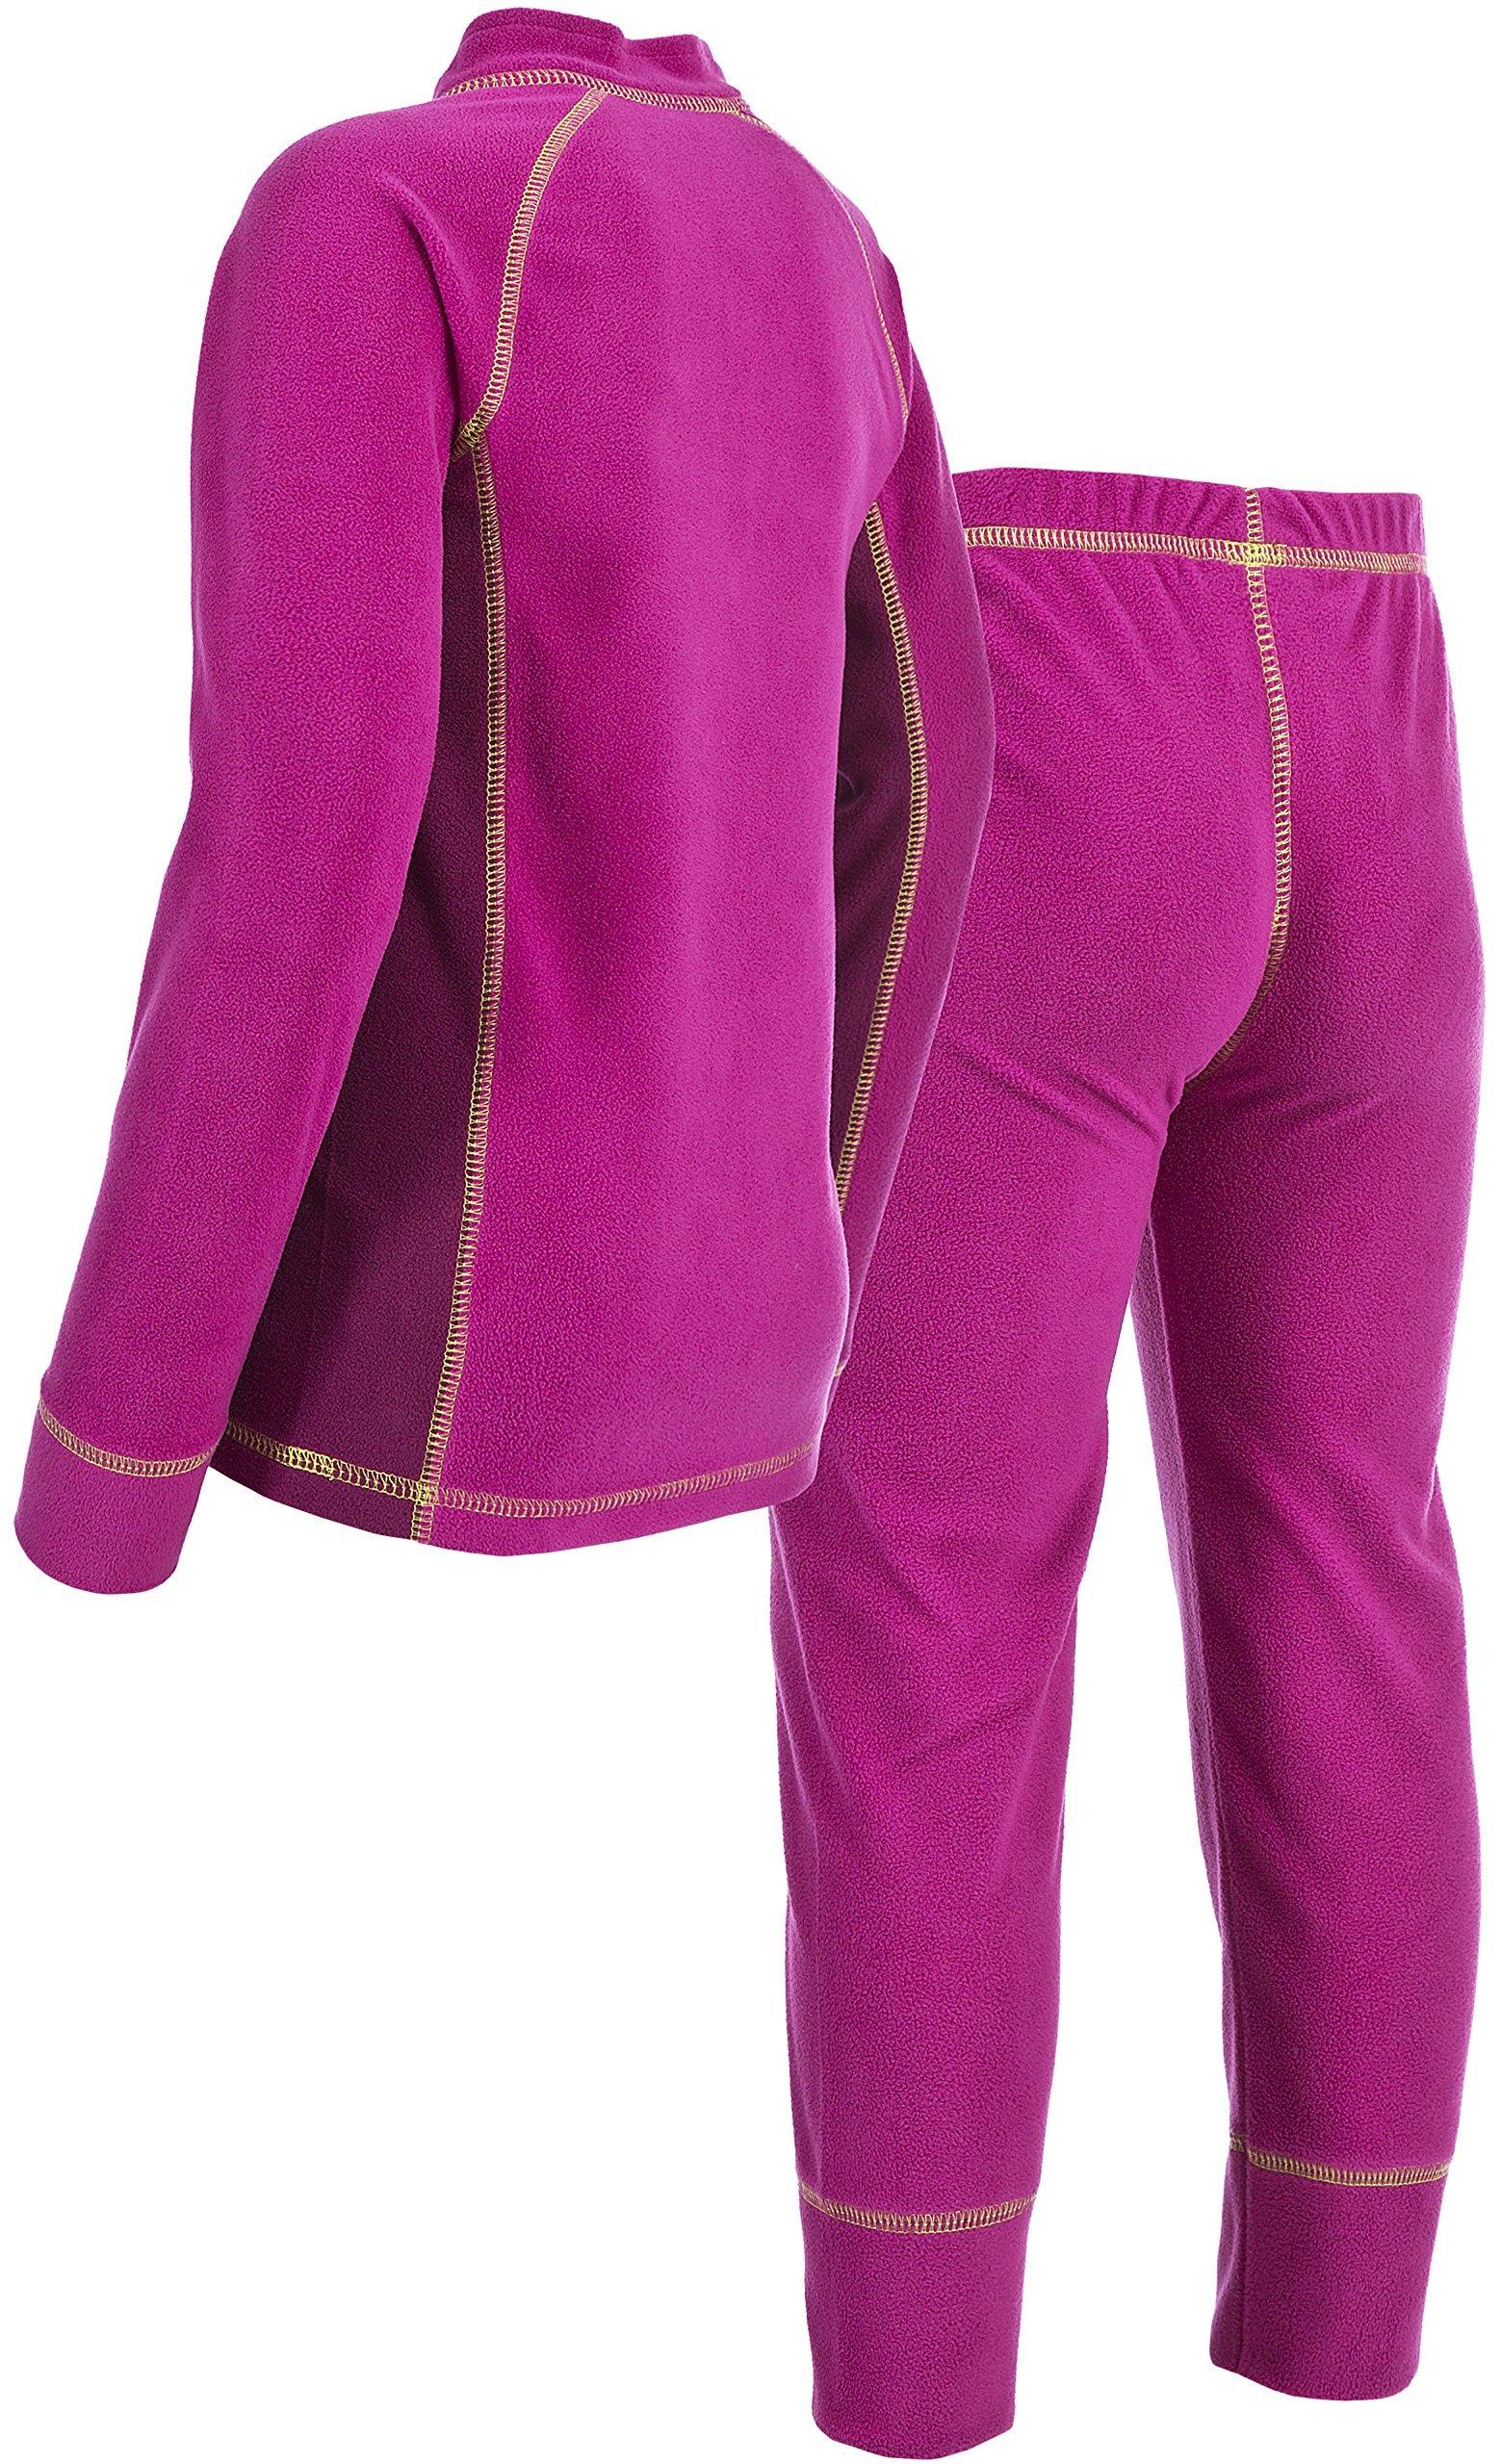 Trespass Kids Bubbles Fleece Base Layer Underwear, Azalea, Size 9/10 by Trespass